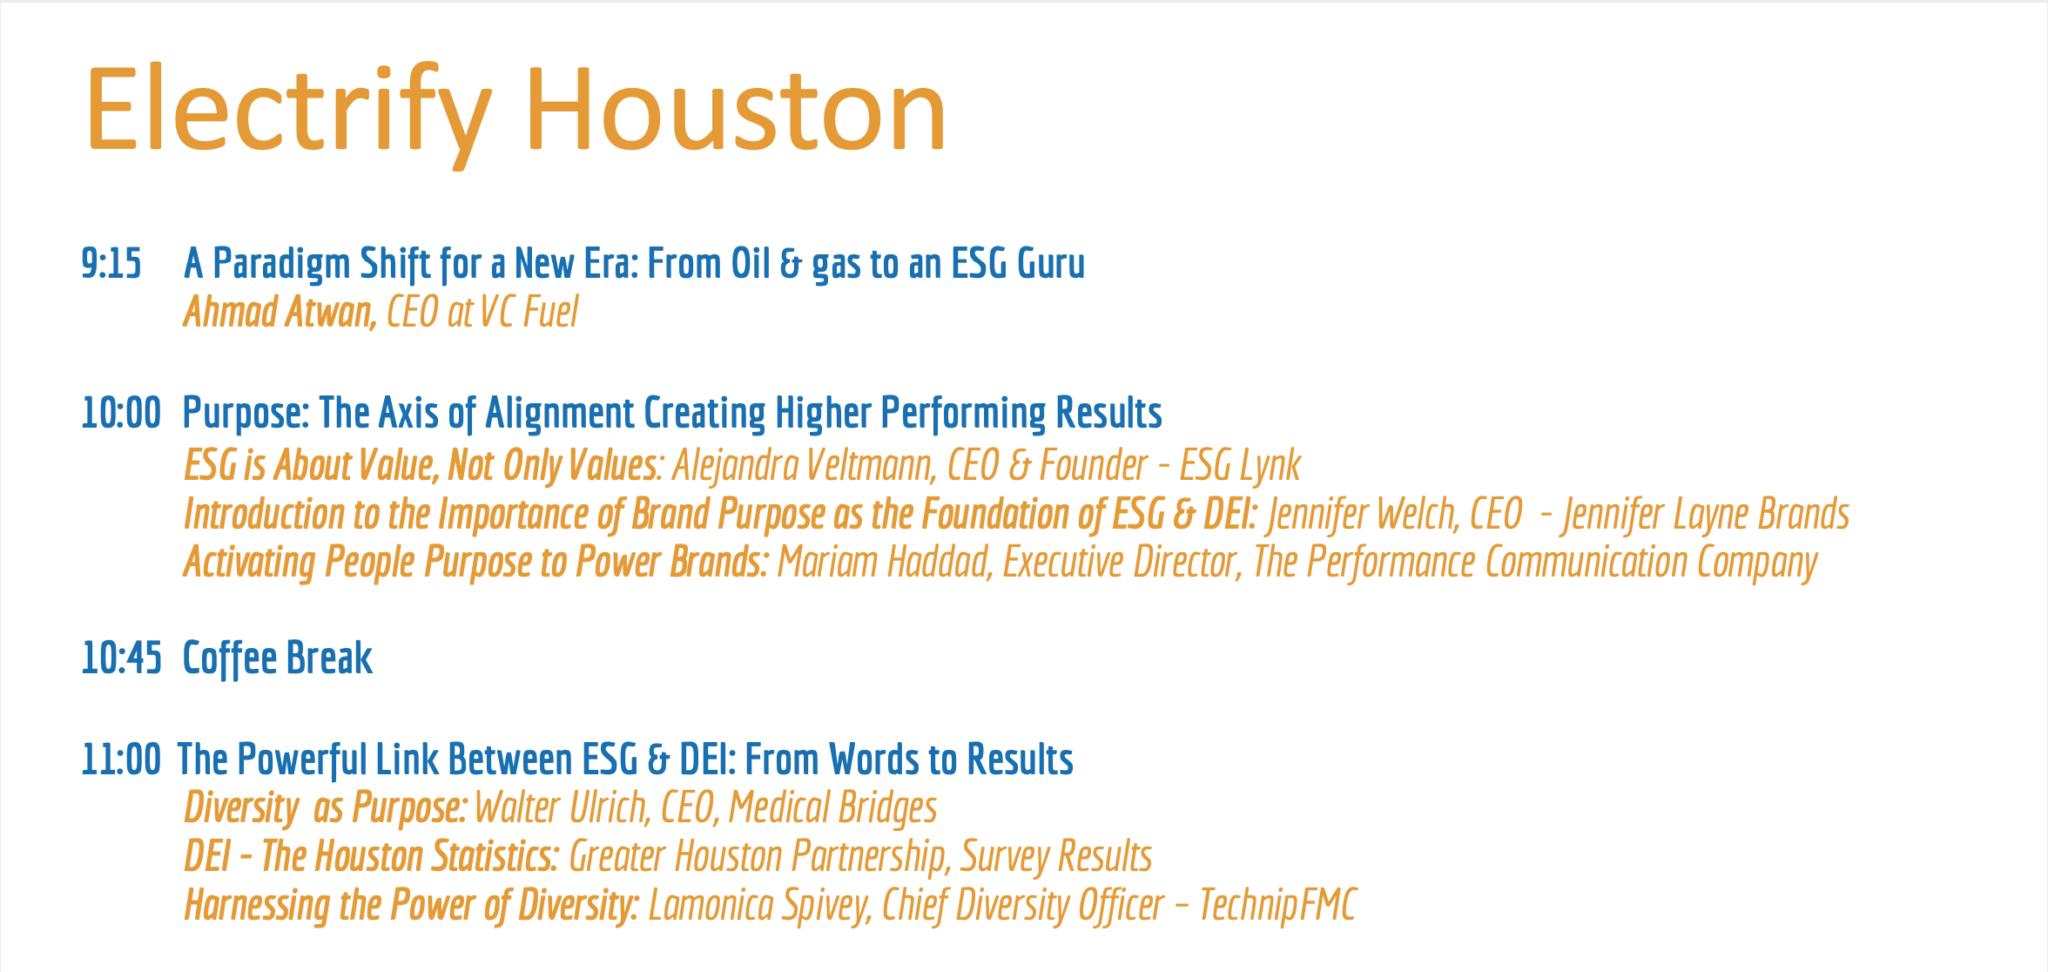 Keynote Speech @ Electrify Houston Summit - Ahmad Atwan